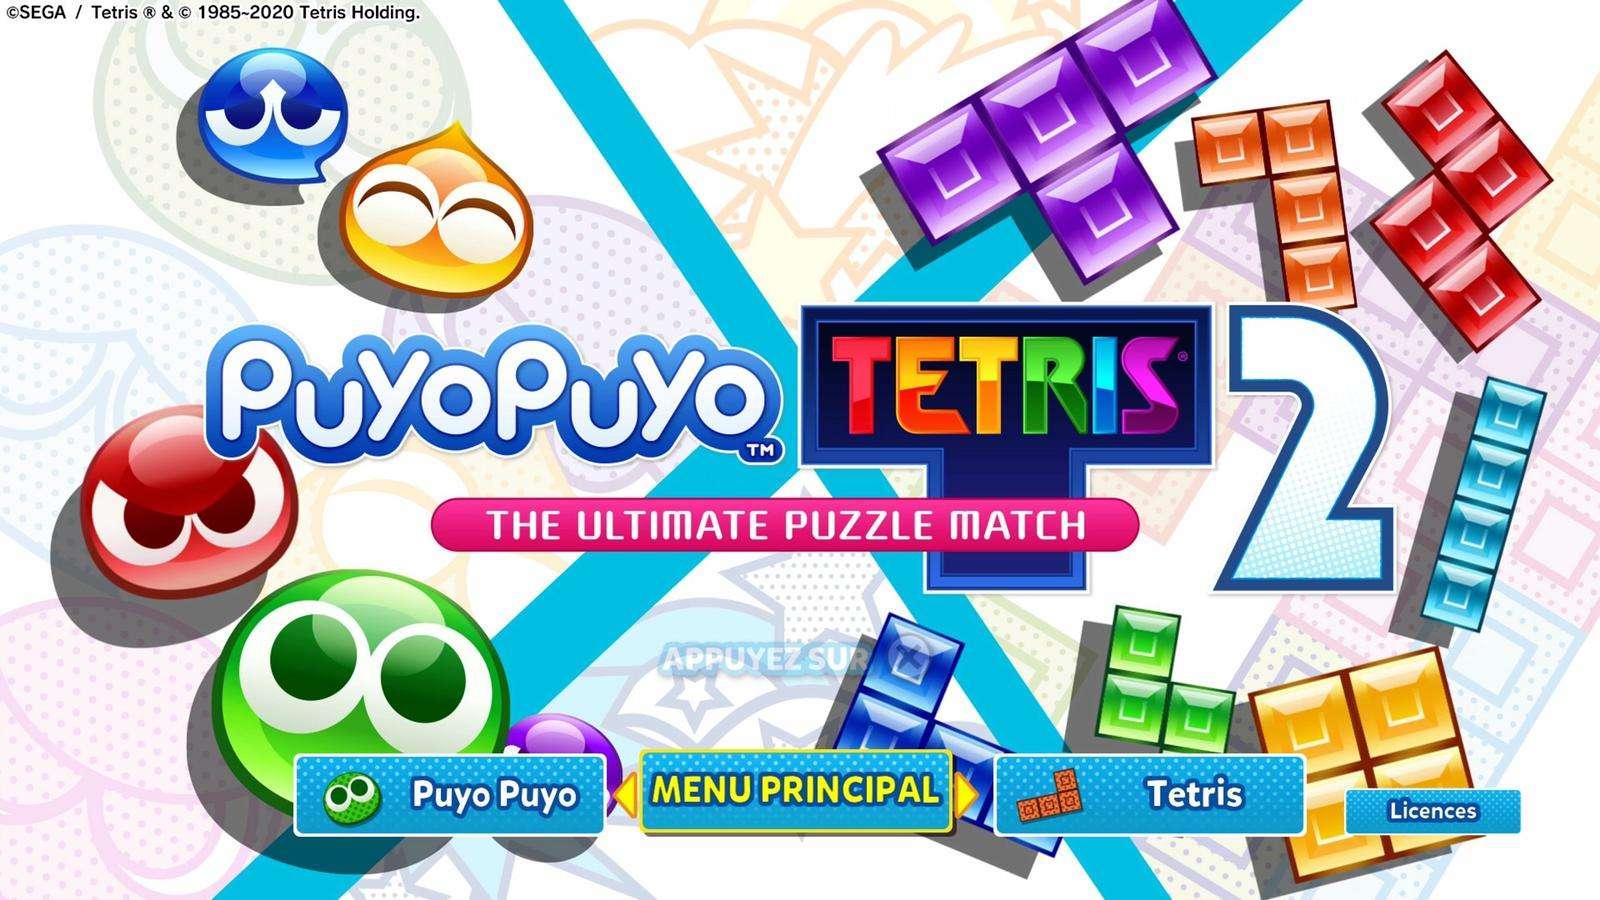 1da5ca963ae4930bda1e0a19cc88ae87 - الإعلان عن لعبة Puyo Puyo Tetris 2 لمنصة الحاسب الشخصي PC